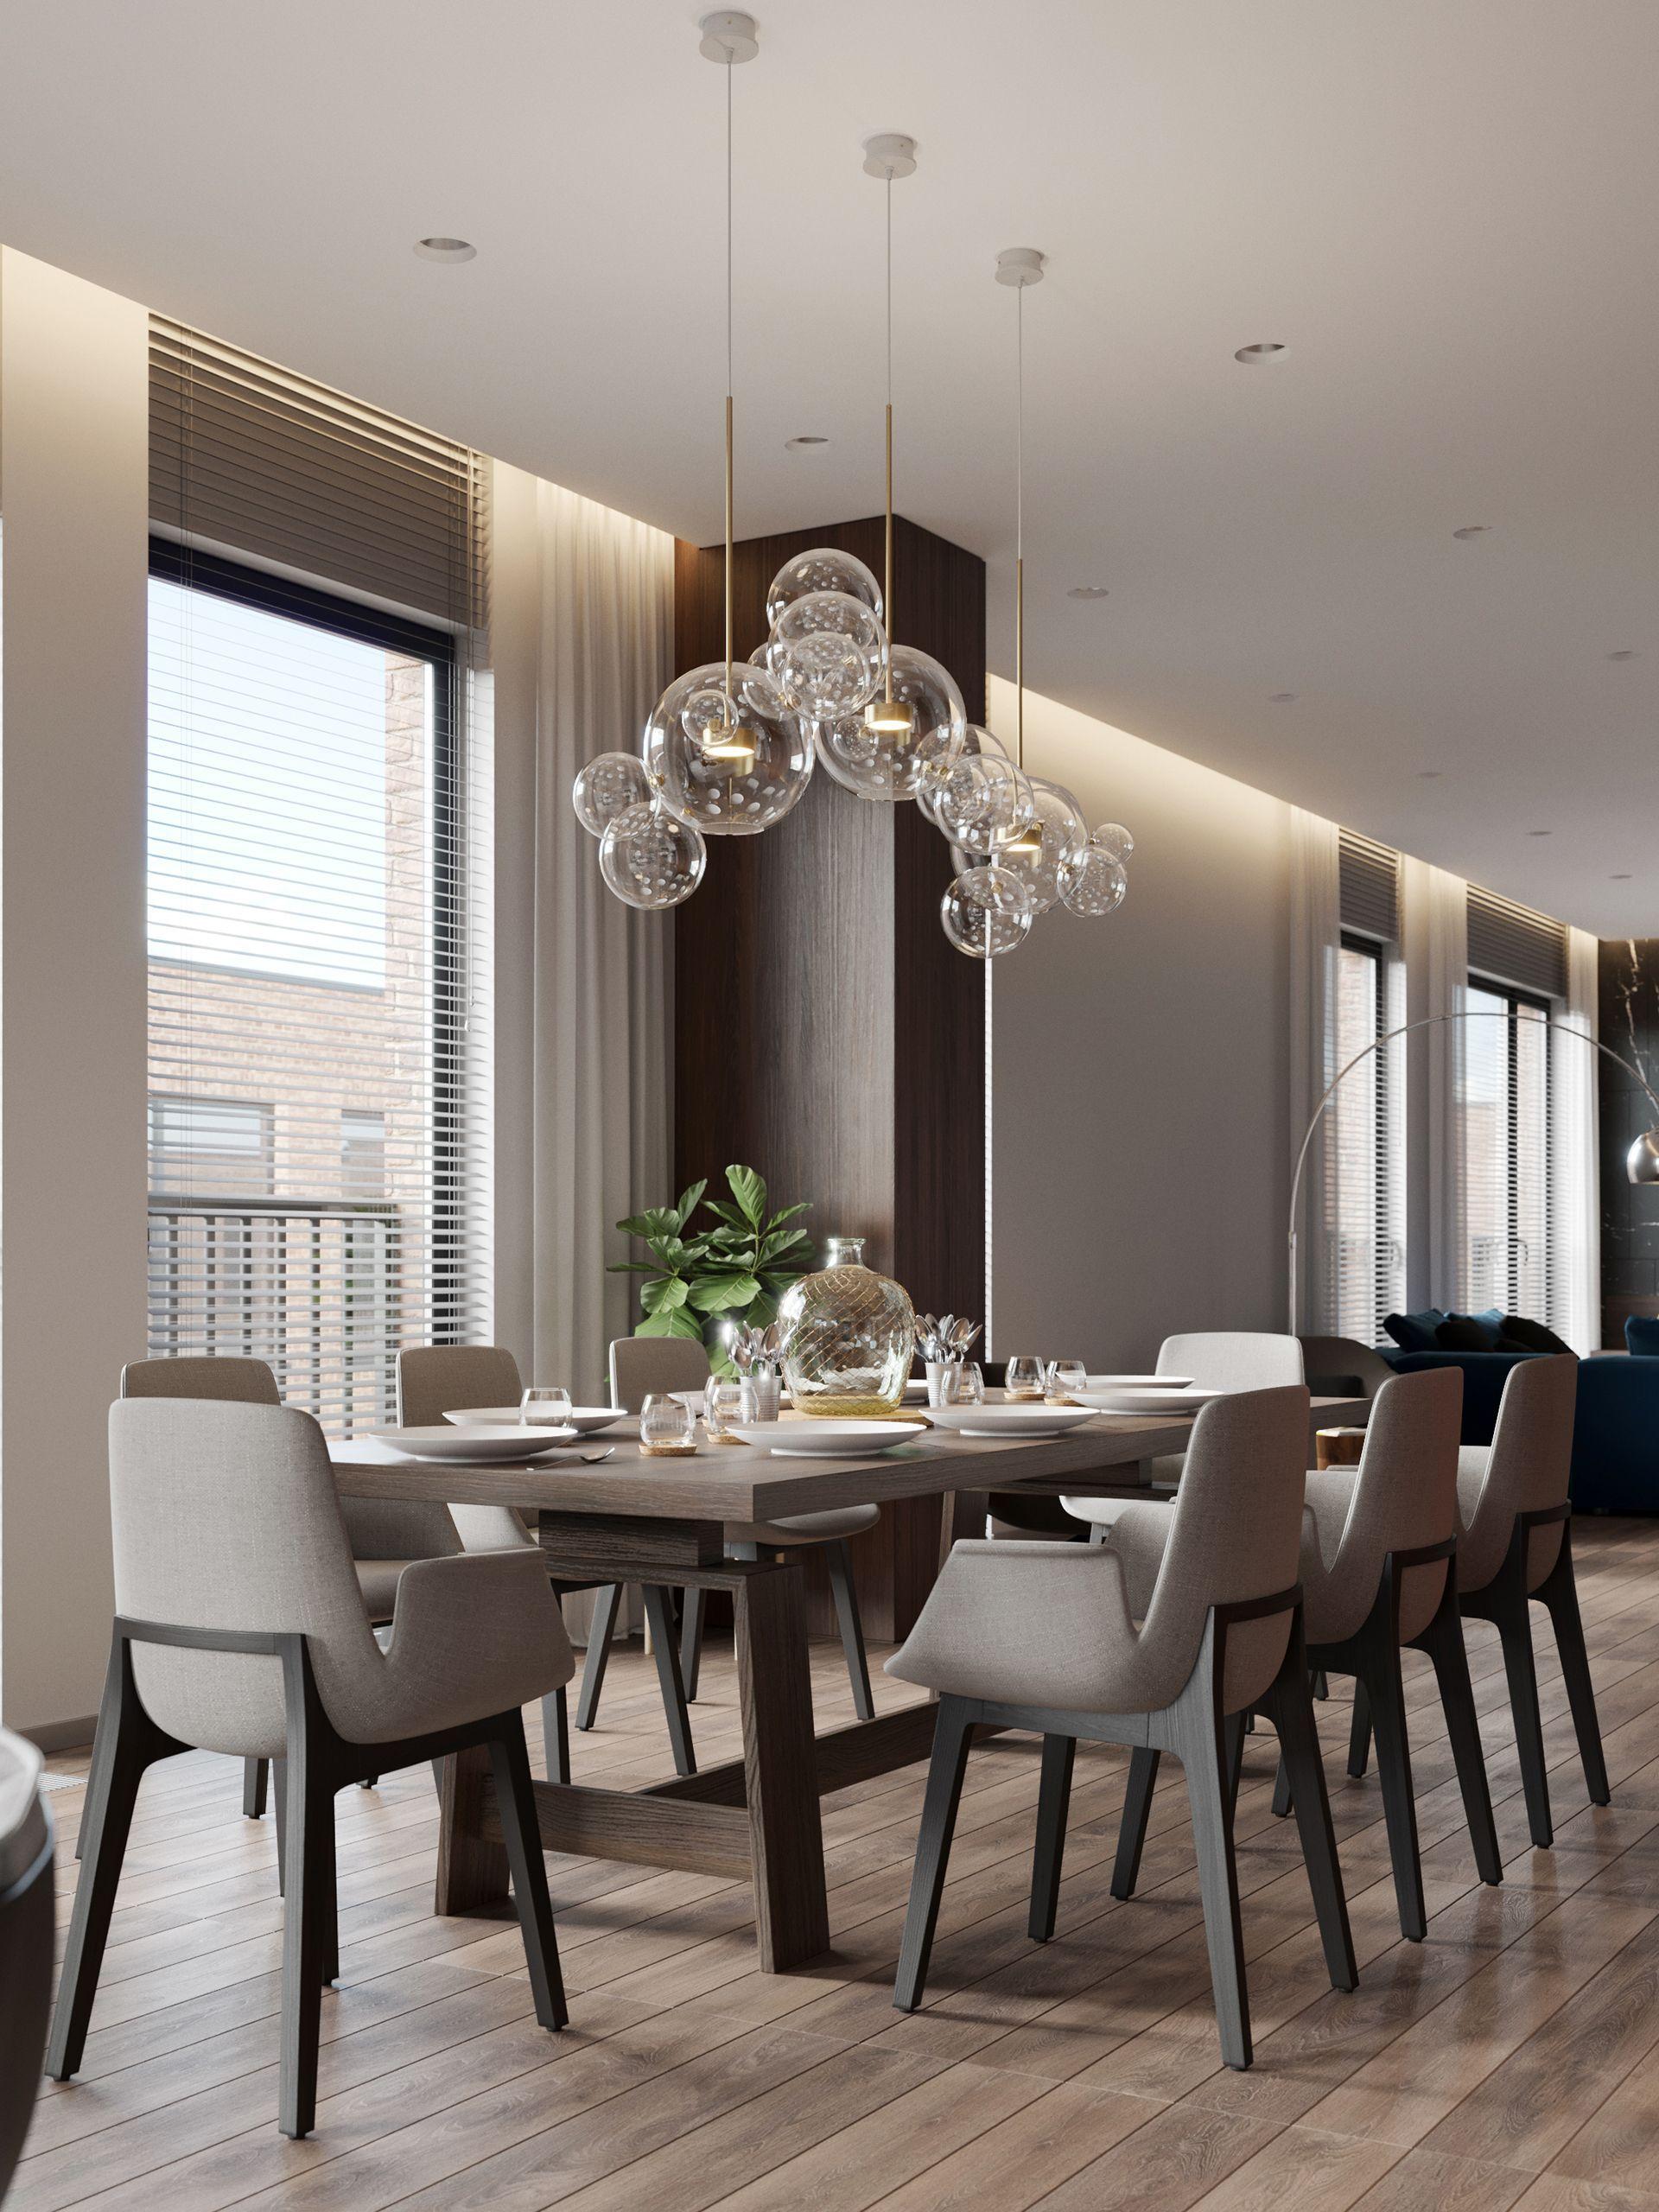 50 Best Modern Dining Room Design Ideas Dinning Room Design